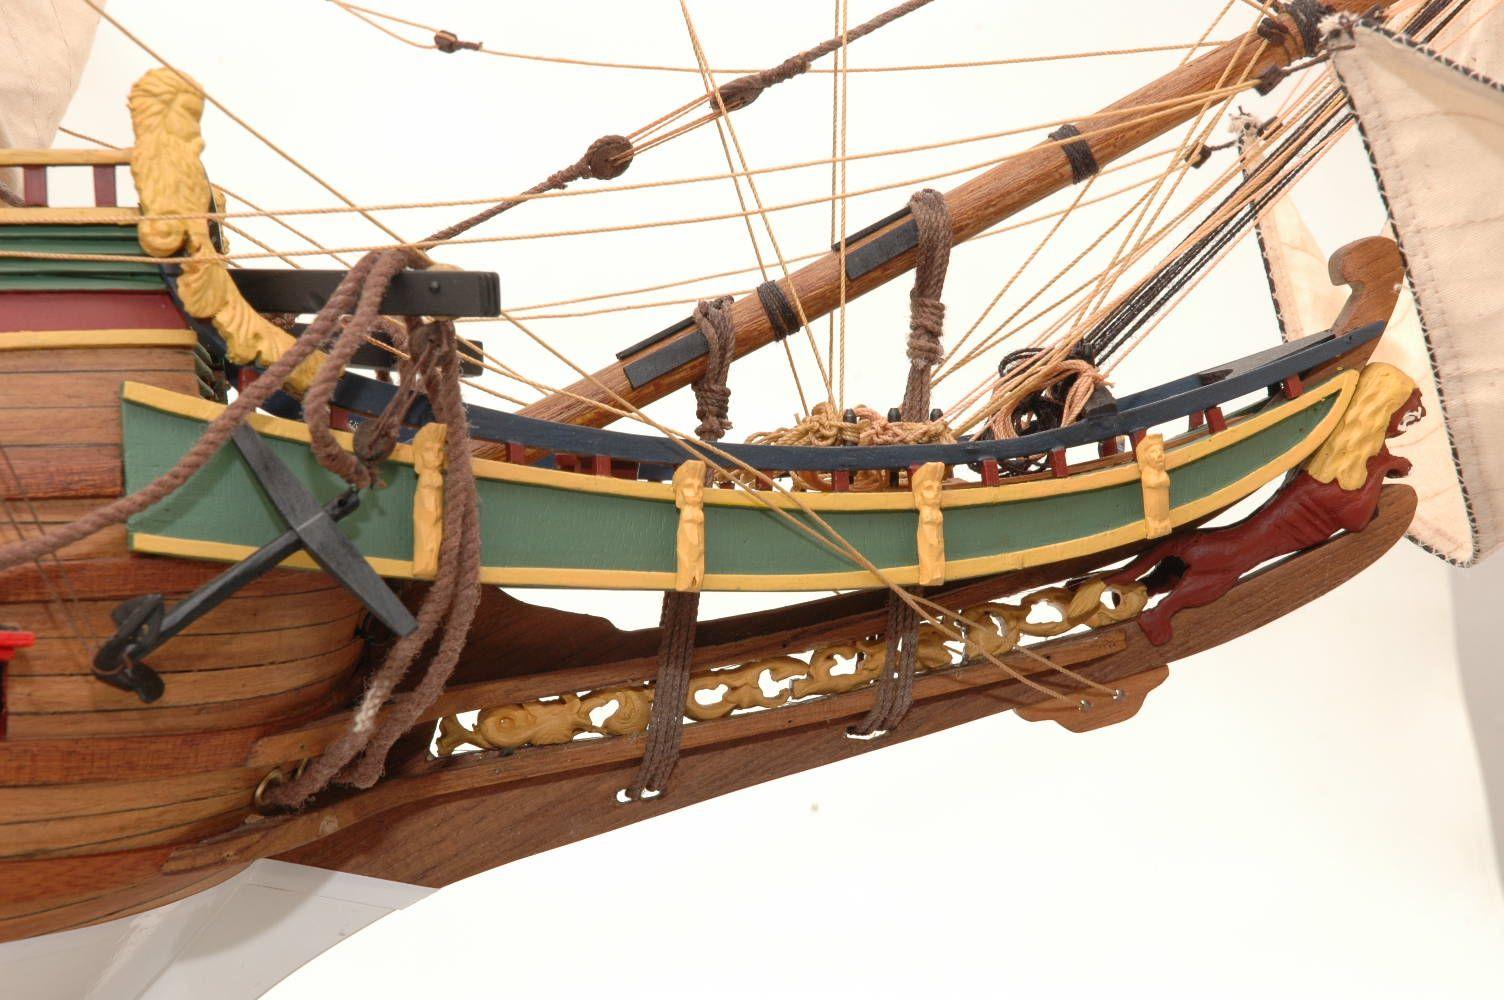 228-6950-Batavia-model-ship-Premier-Range